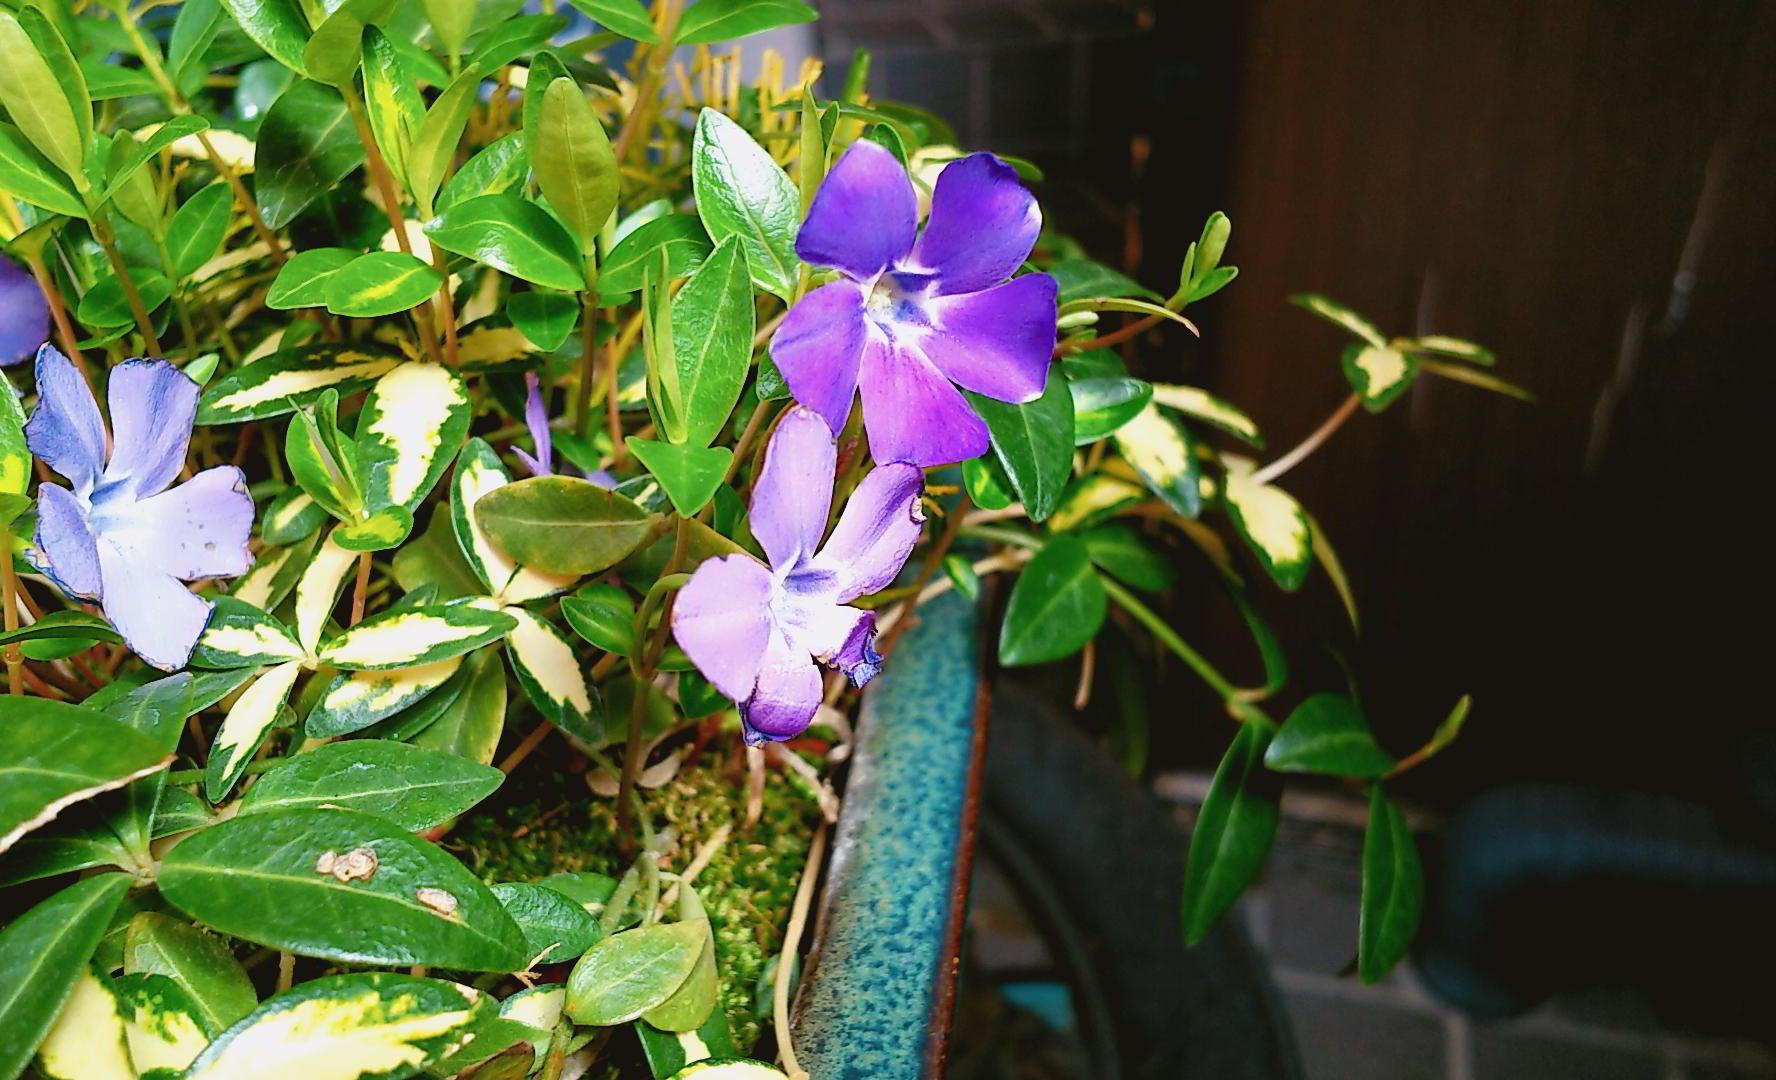 http://www.tomihiro.co.jp/blog/2020/03/23/IMG_20200323_100602131.jpg